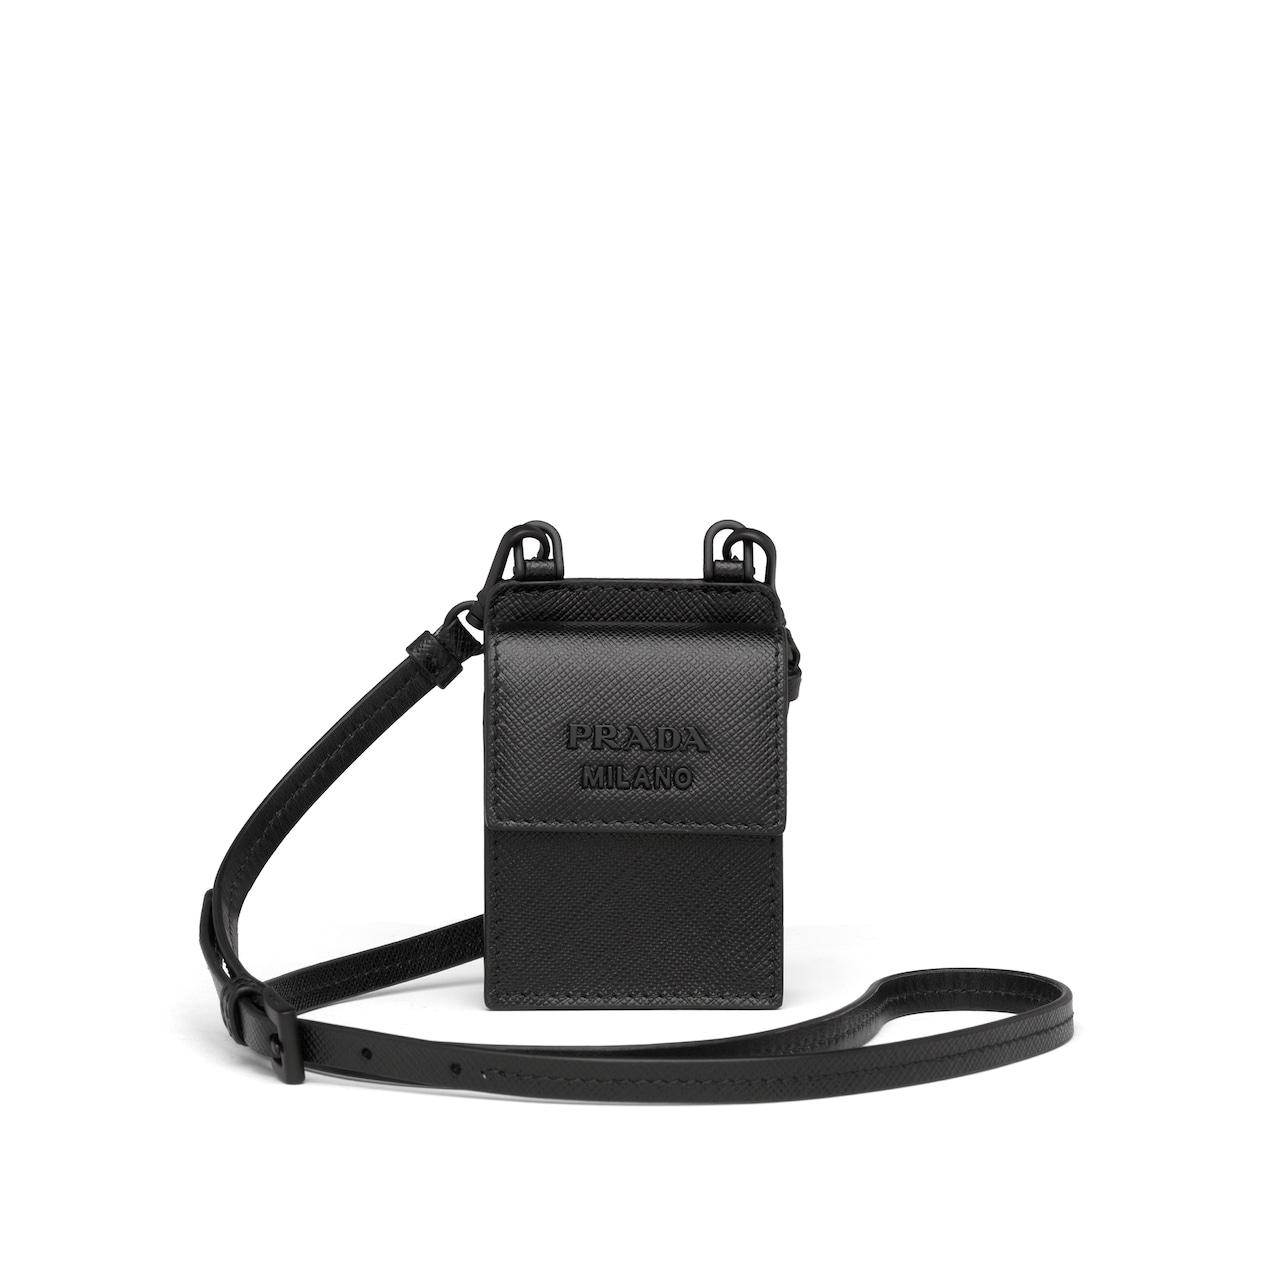 Prada Headphone case with shoulder strap 1